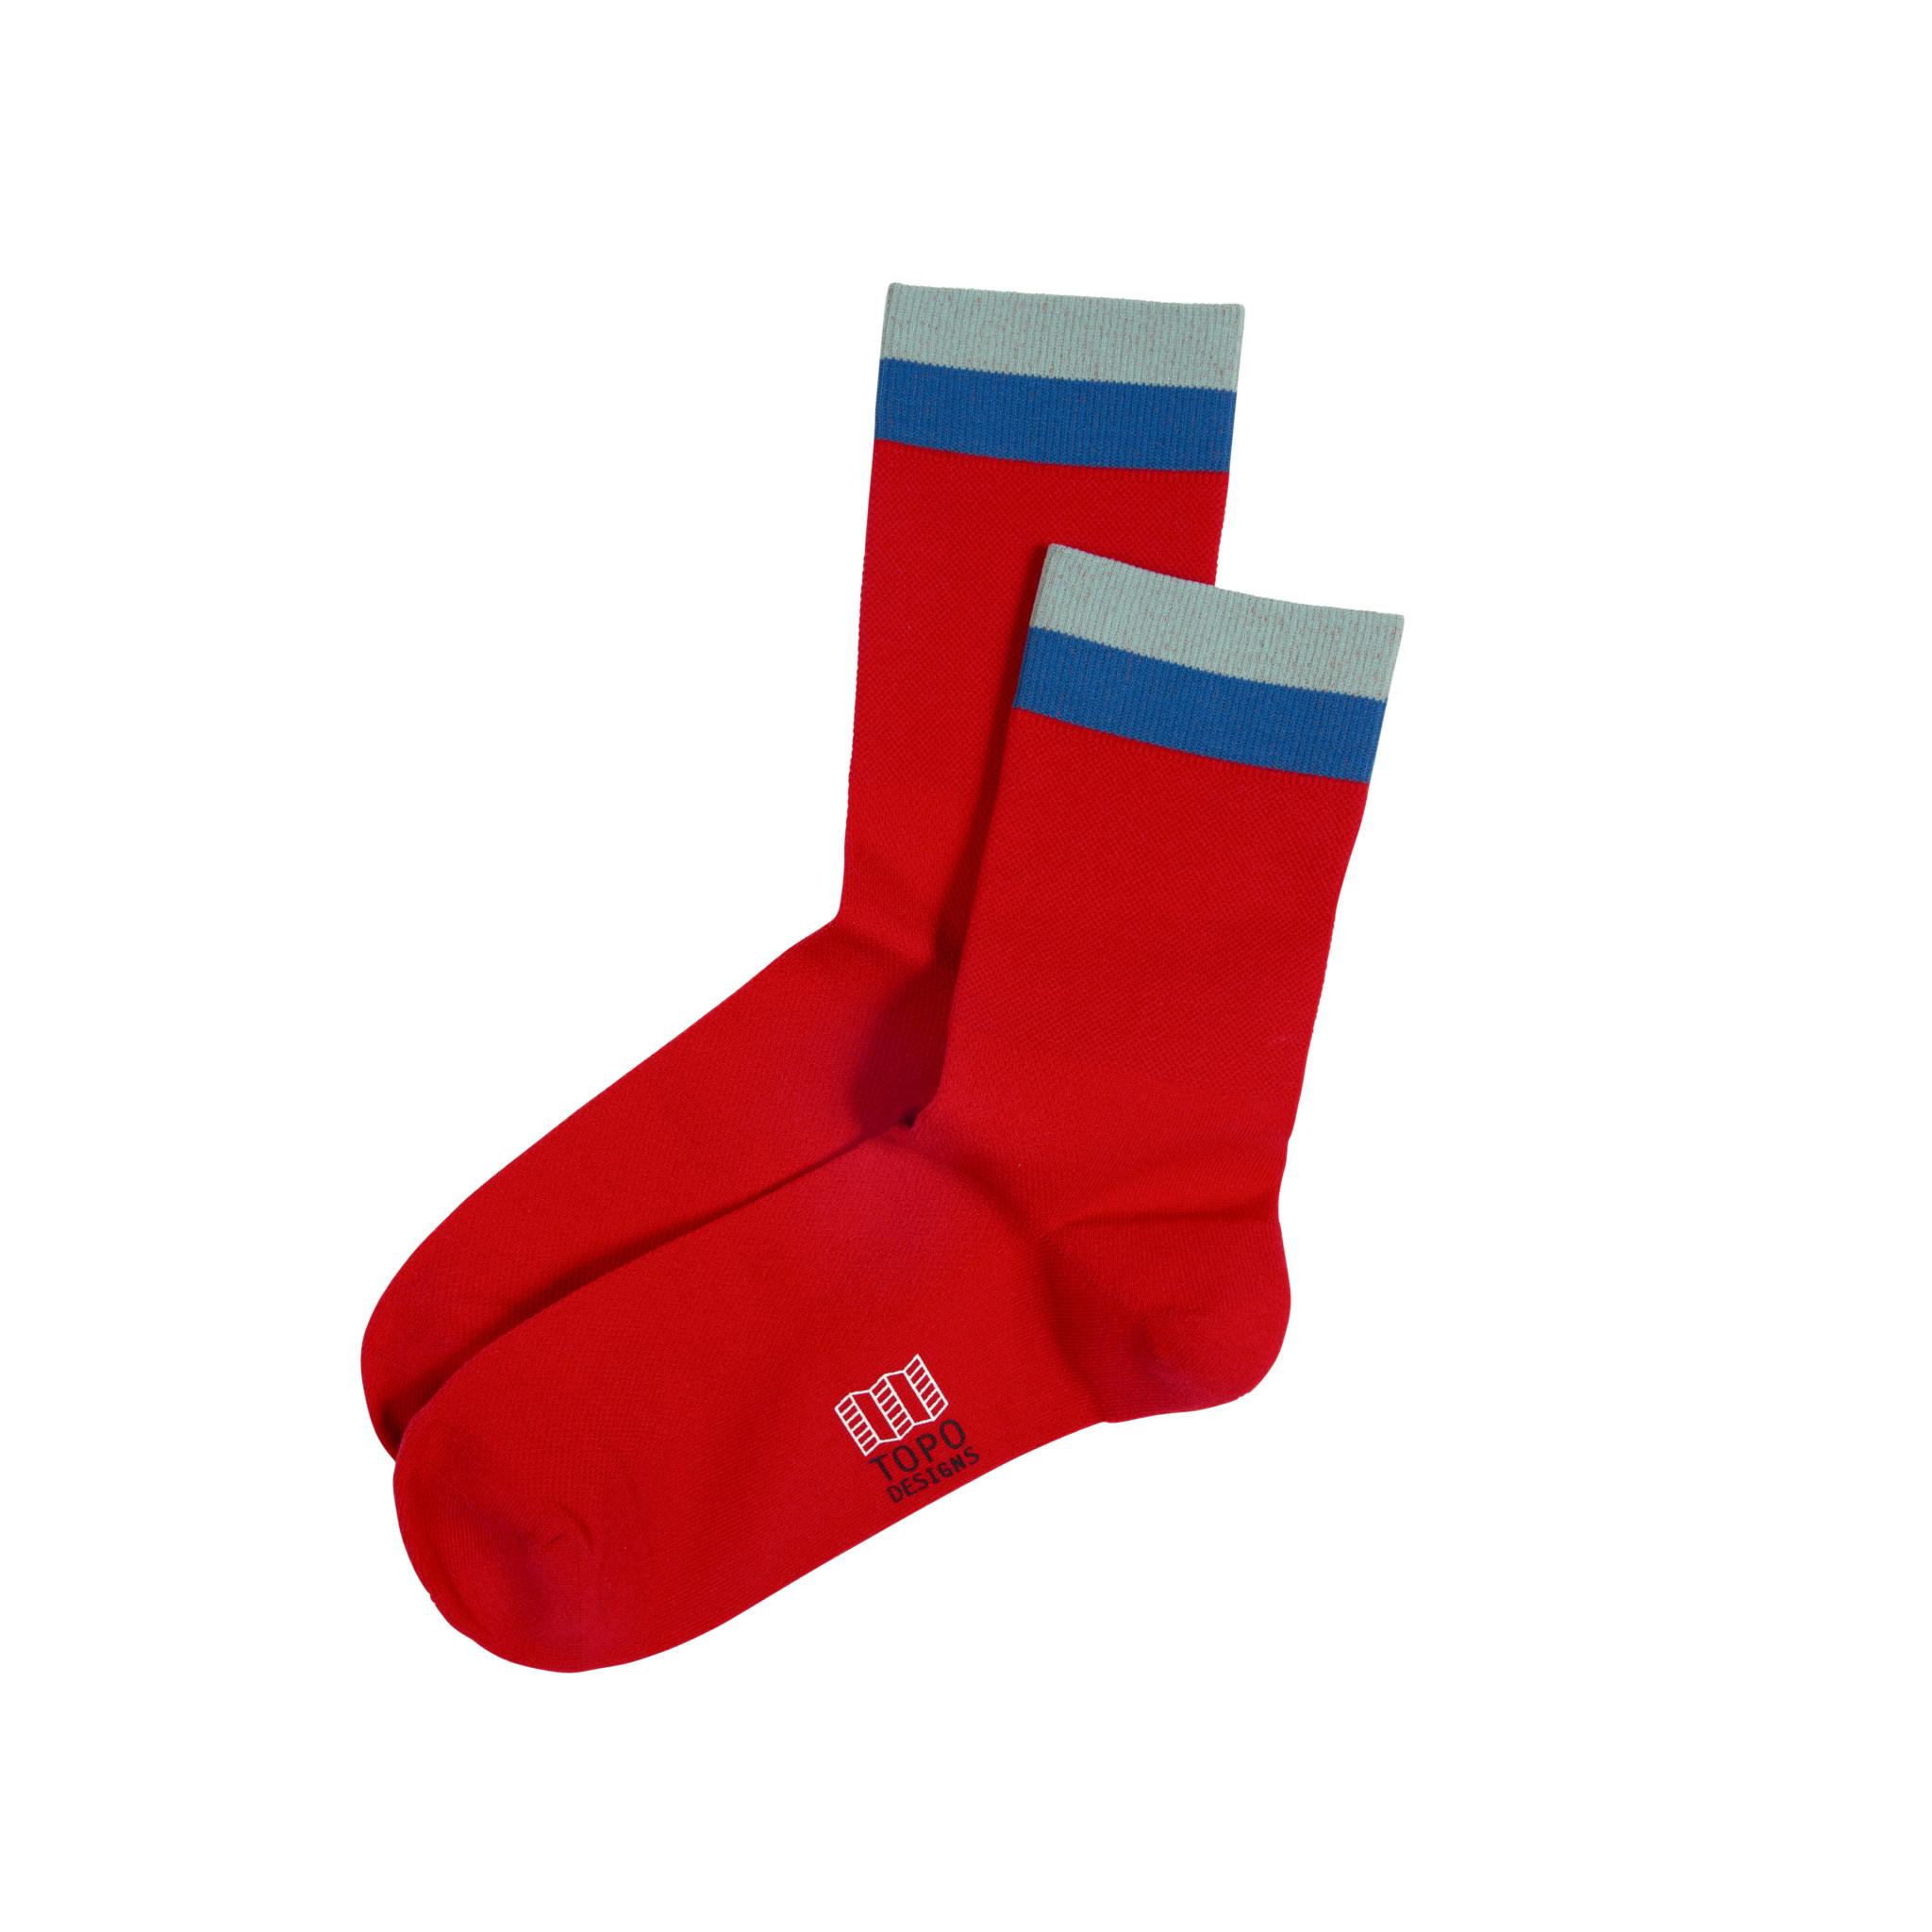 Topo Designs Topo Designs Sport Socks - Red